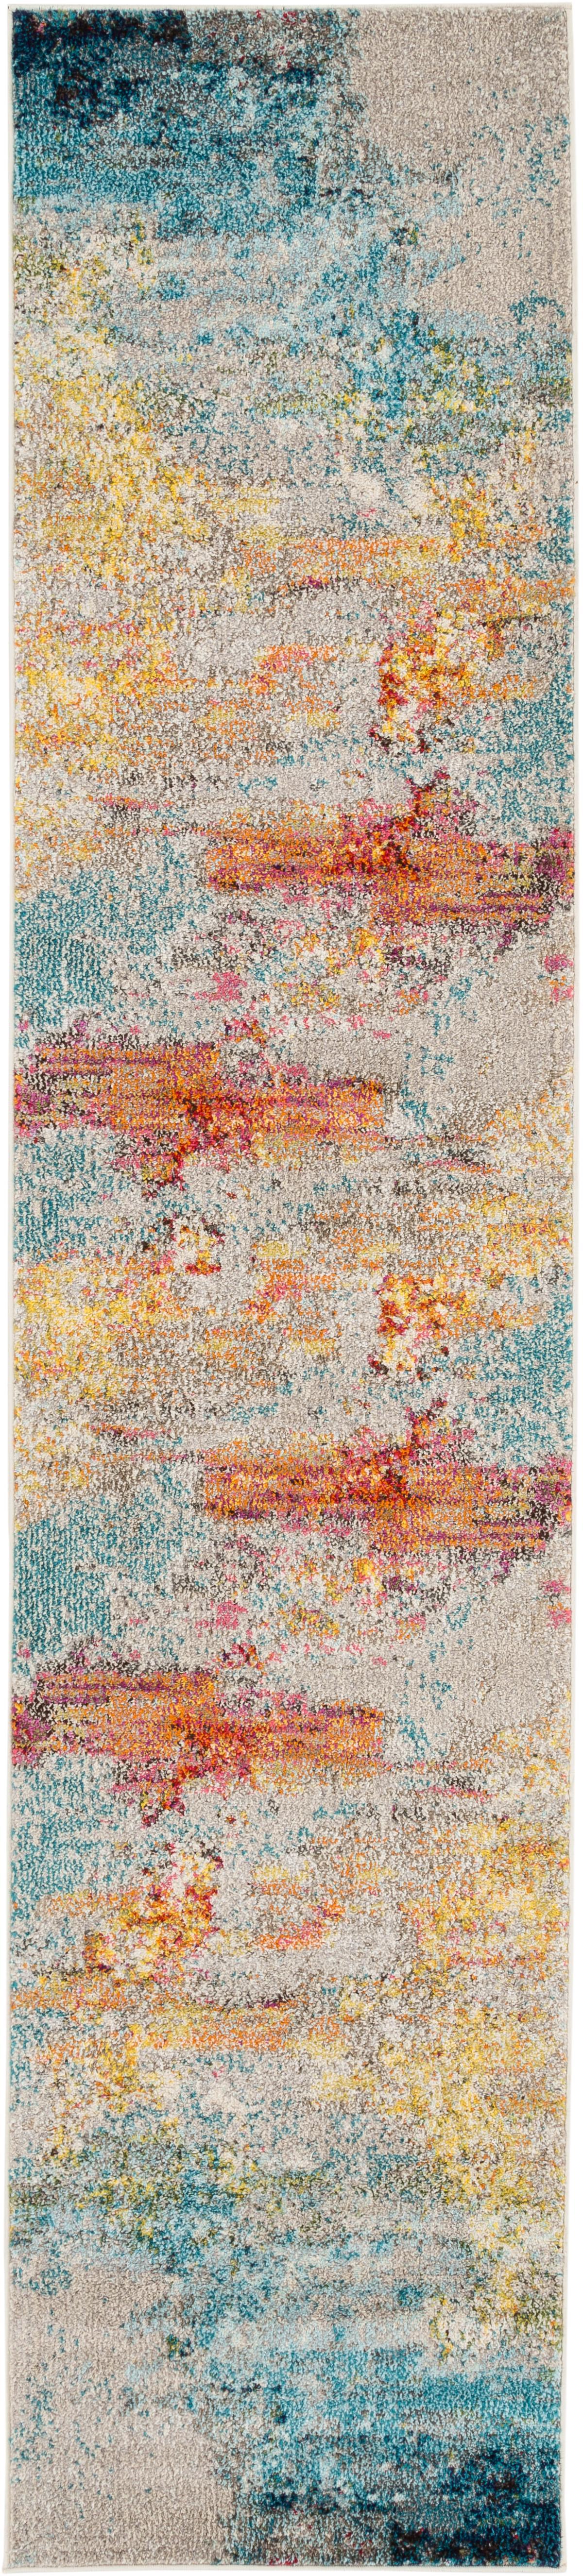 Design Läufer Celestial in Bunt, Flor: 100% Polypropylene, Mehrfarbig, 70 x 305 cm